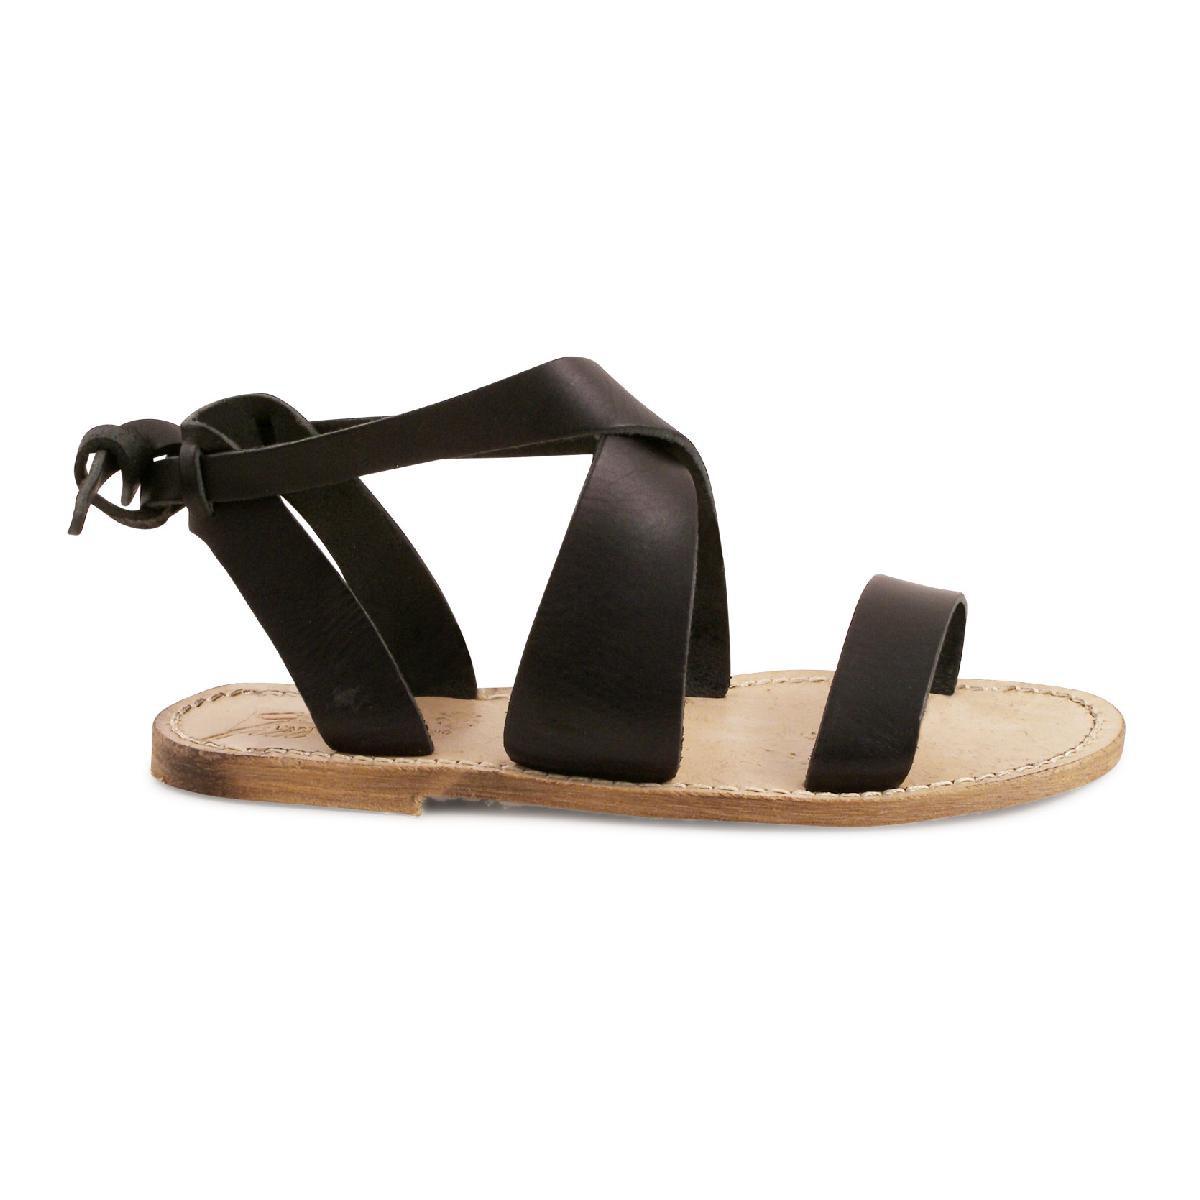 Original Wooshoesblog U2013 FitFlop Womenu2019s Chada Leather Sandals